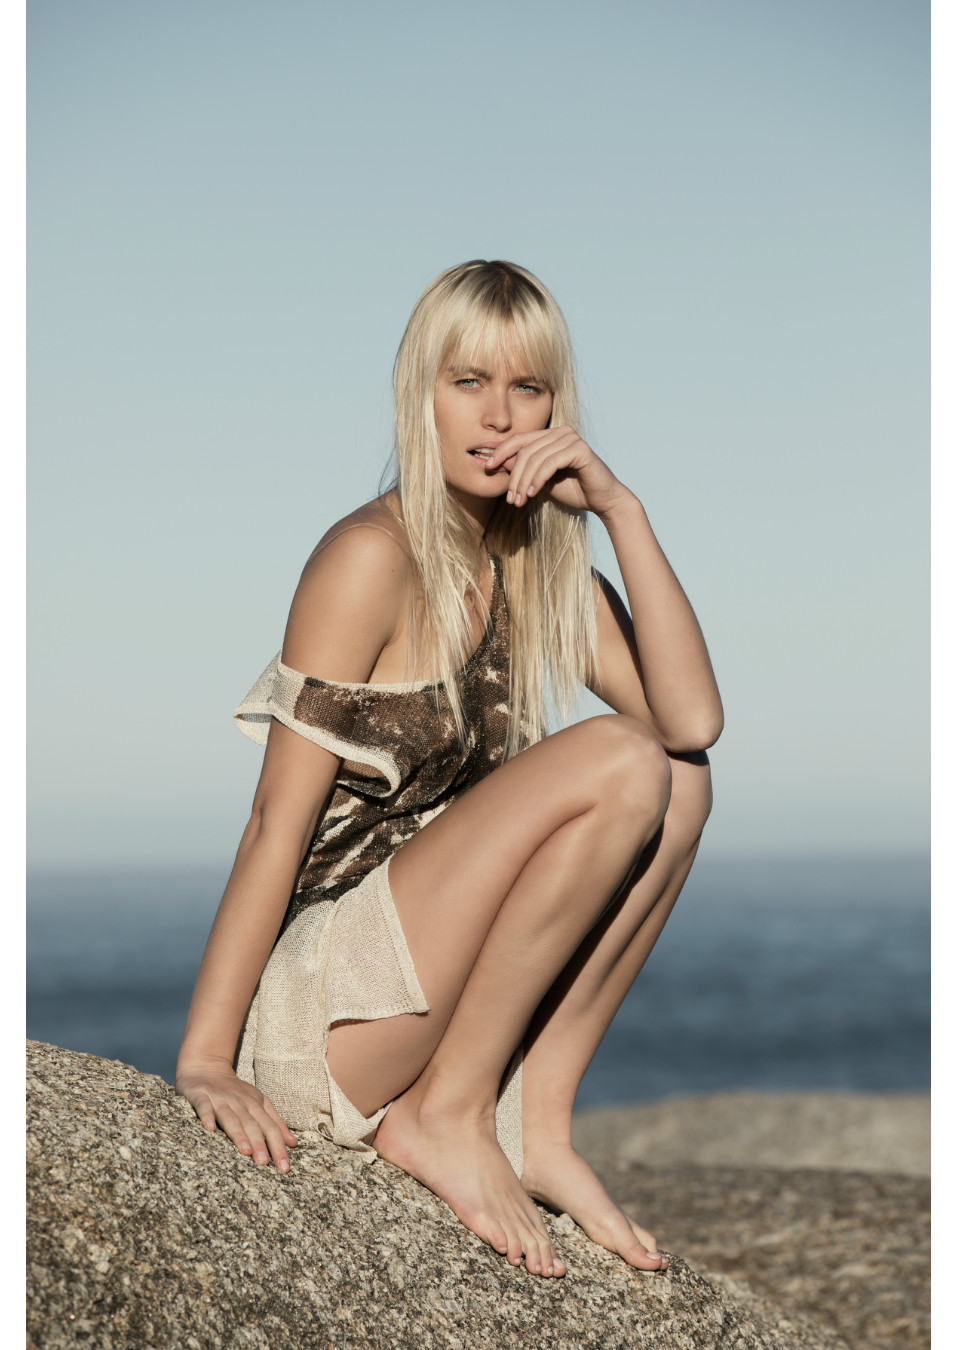 Getriin Kivi nude (51 pics), images Topless, iCloud, lingerie 2017